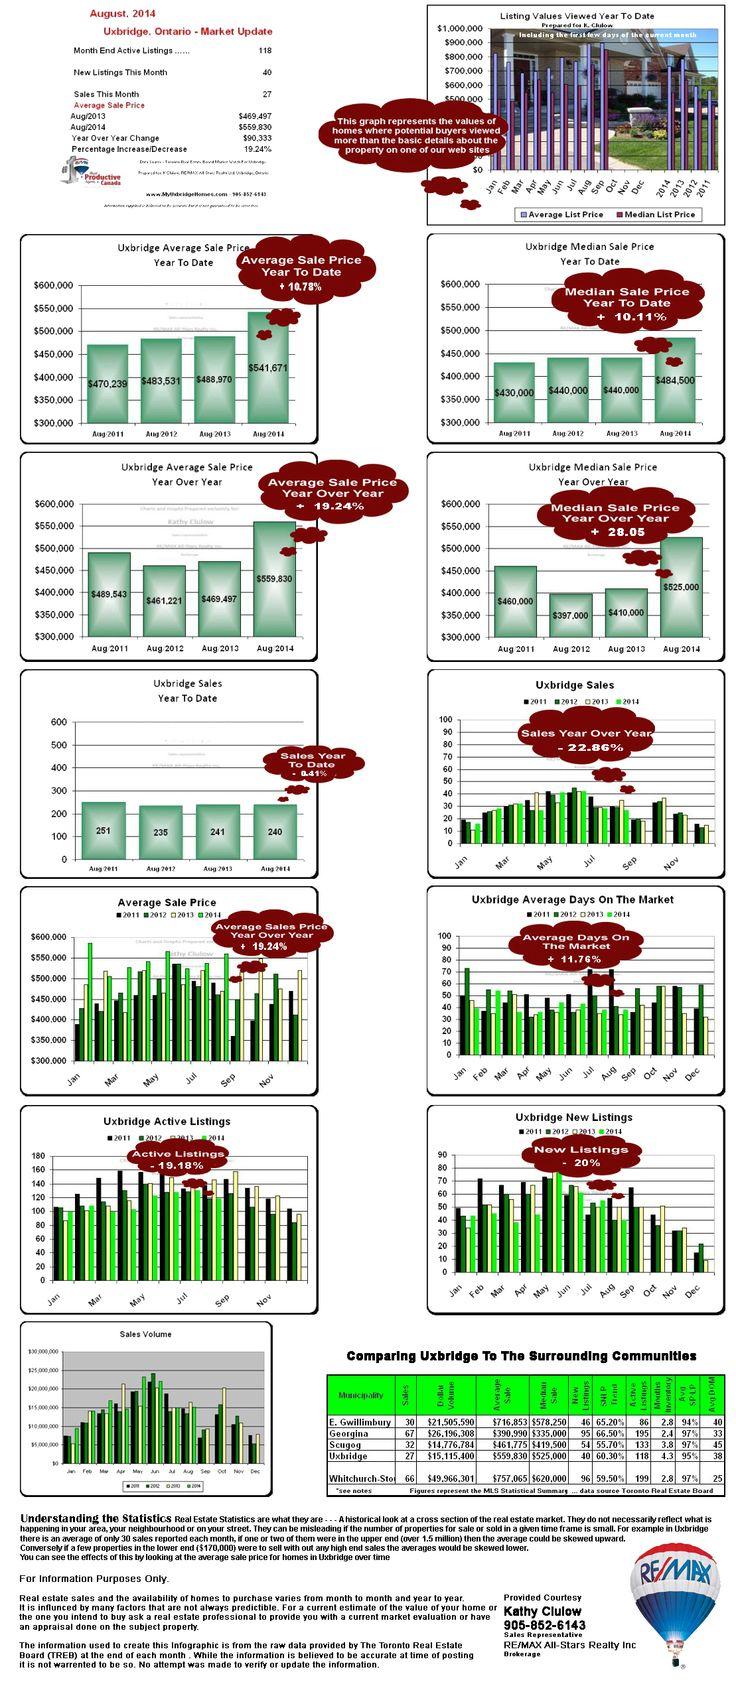 August 2014 Uxbridge Real Estate Market Update by  #KathyClulow 905.852.6143 www.KathyClulow.ca